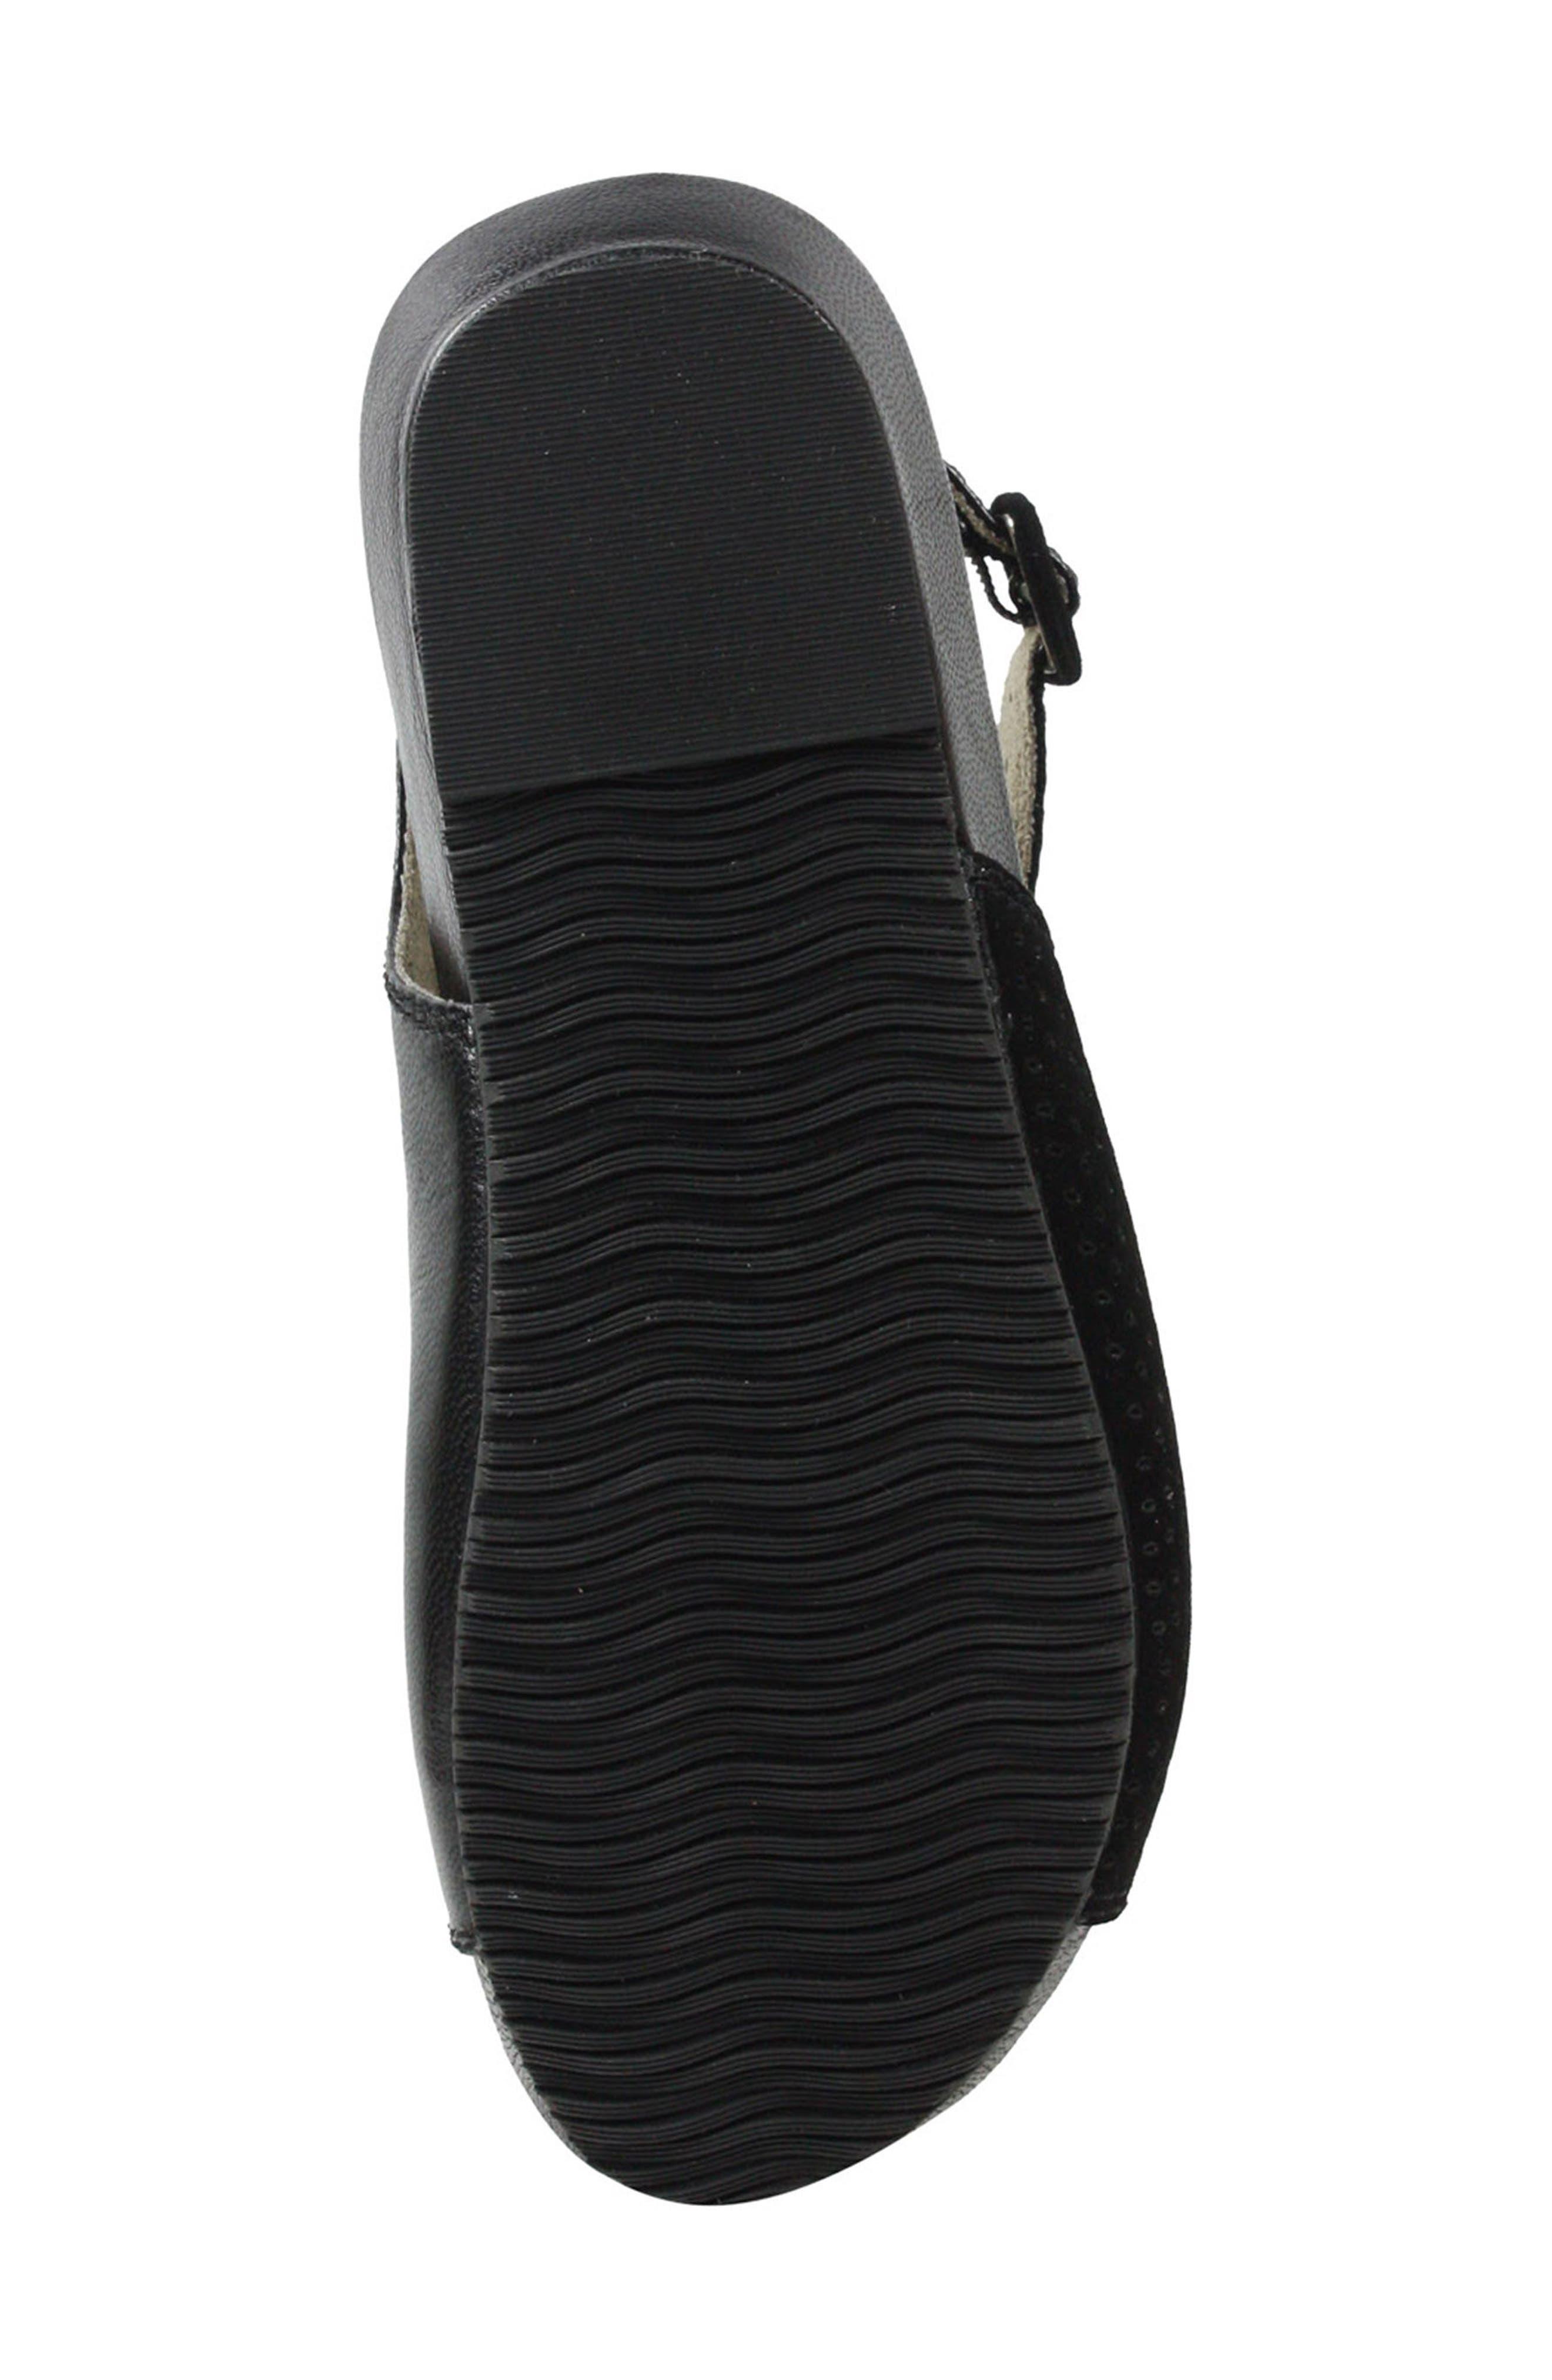 Dalenna Ankle Strap Sandal,                             Alternate thumbnail 6, color,                             Black Leather